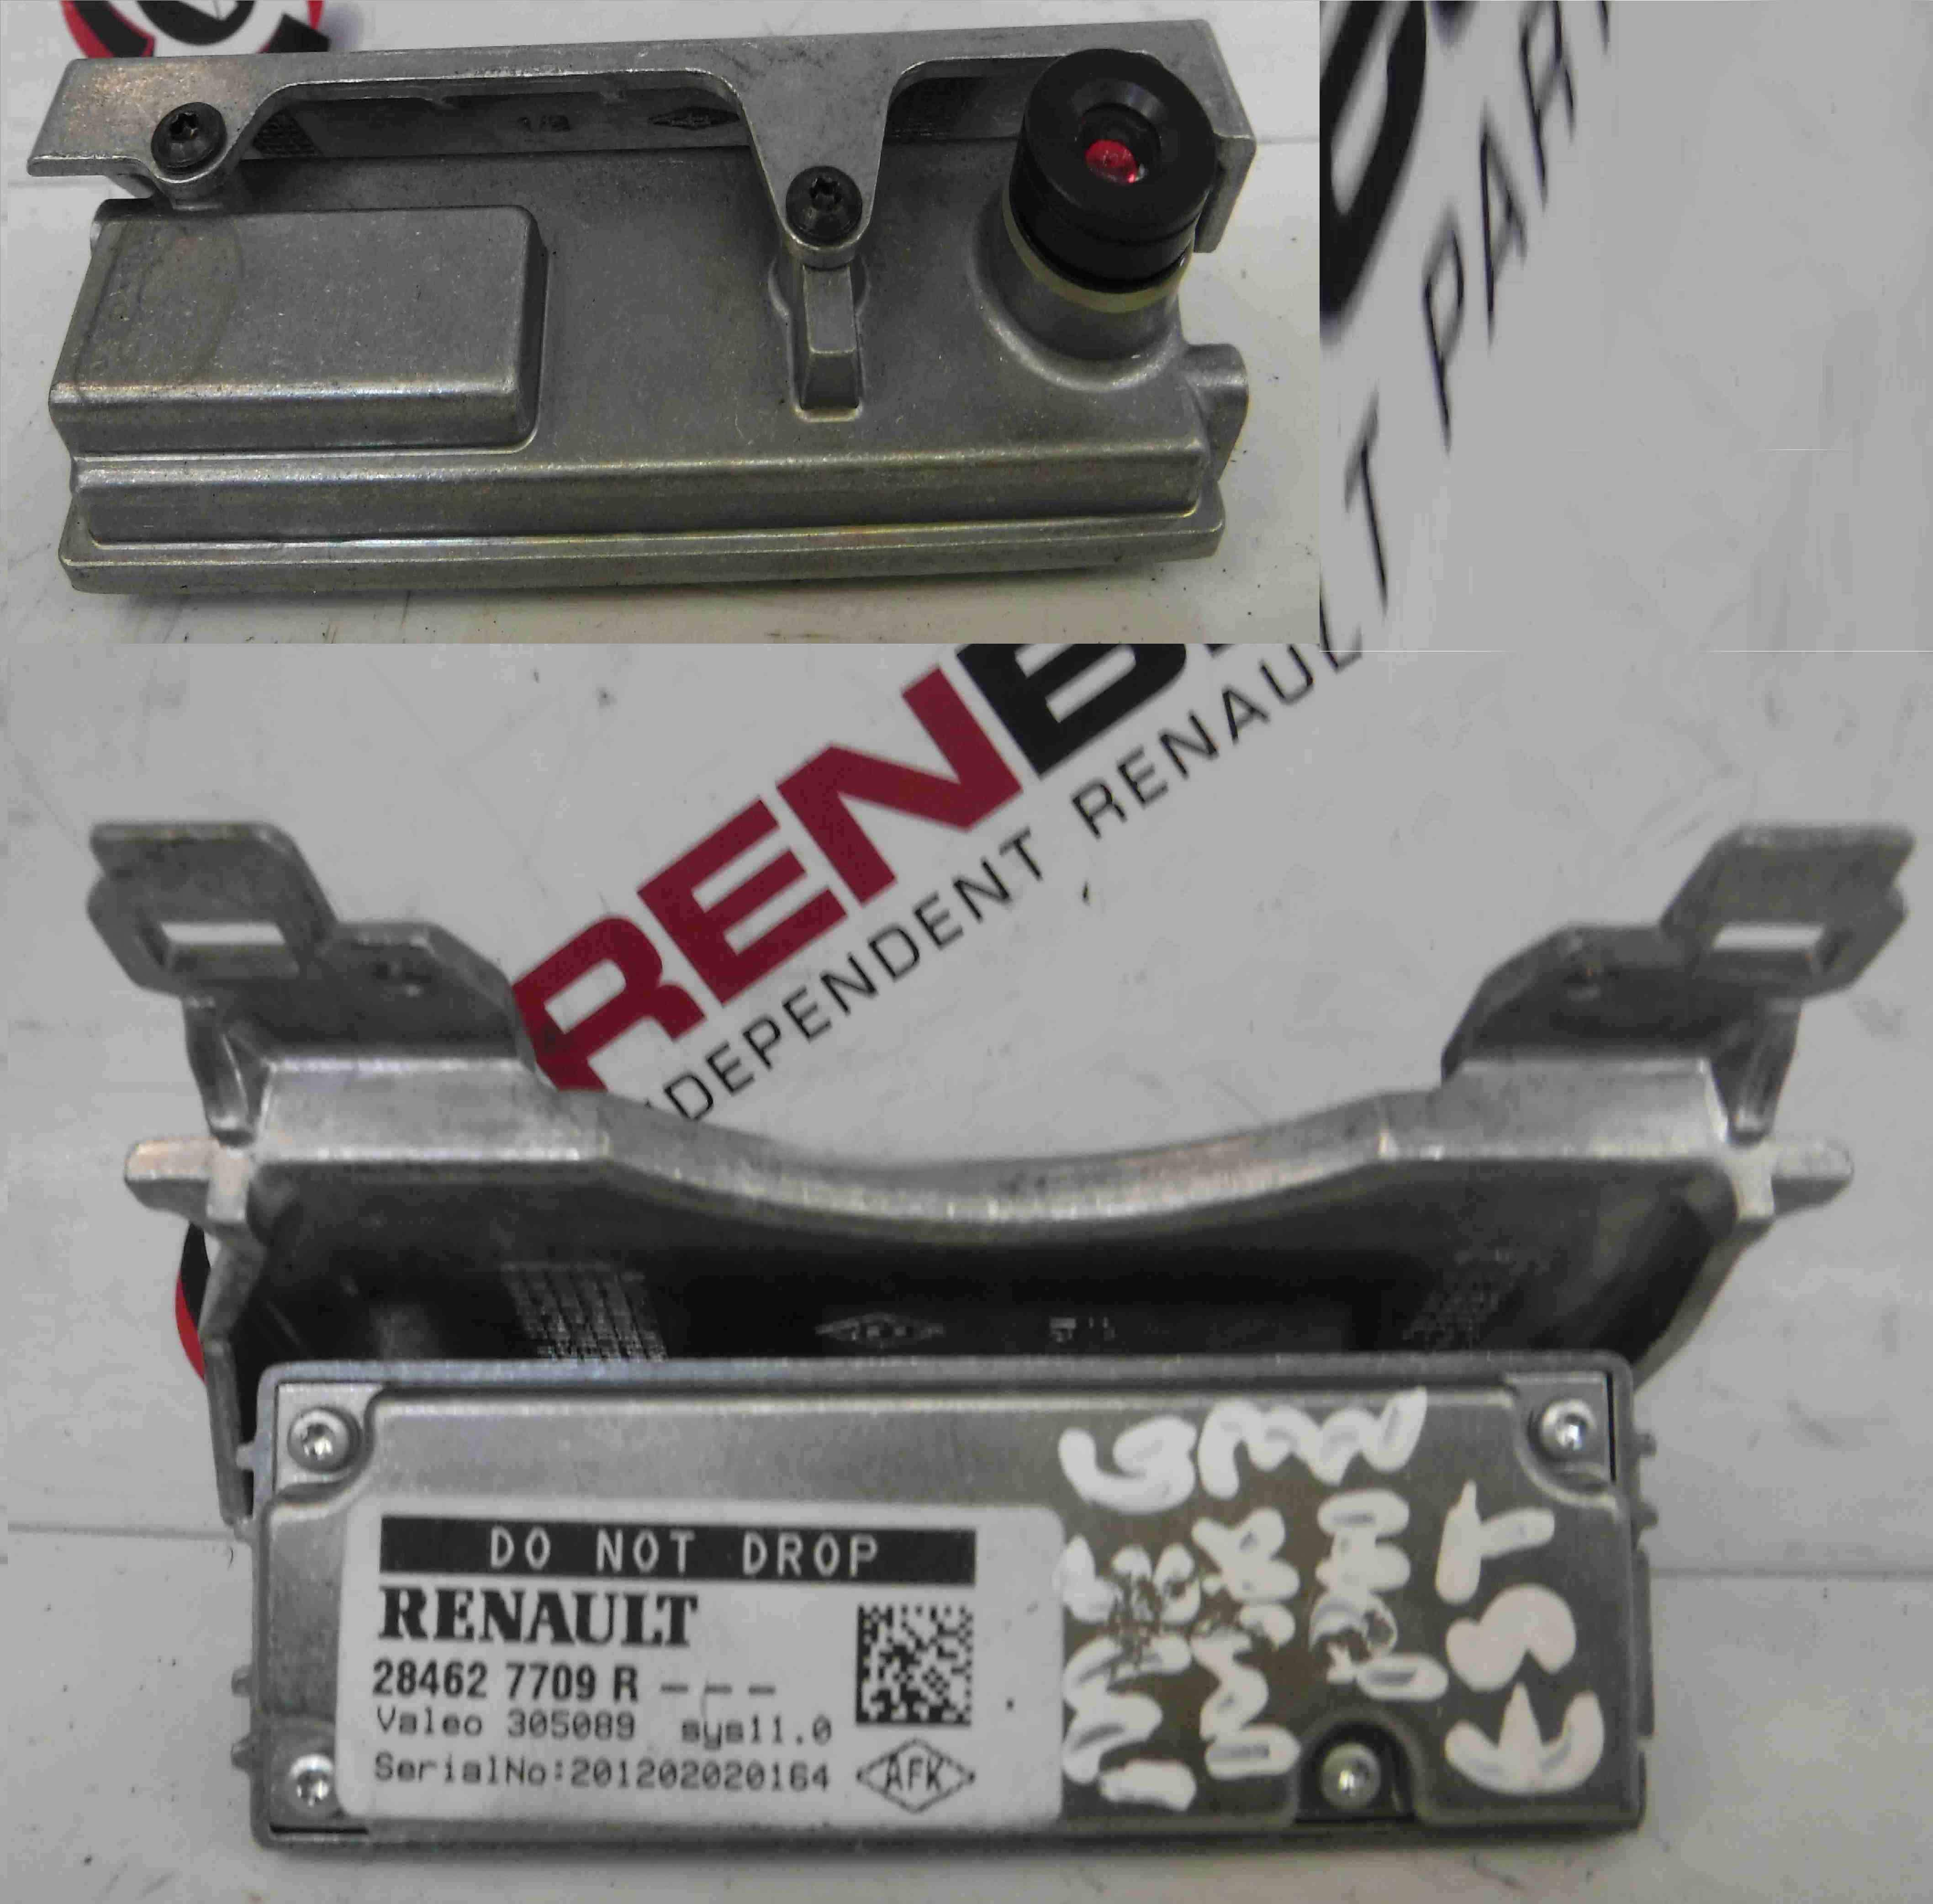 Renault Megane  Scenic MK3 2008-2014 Front Camera Complete 284627709R